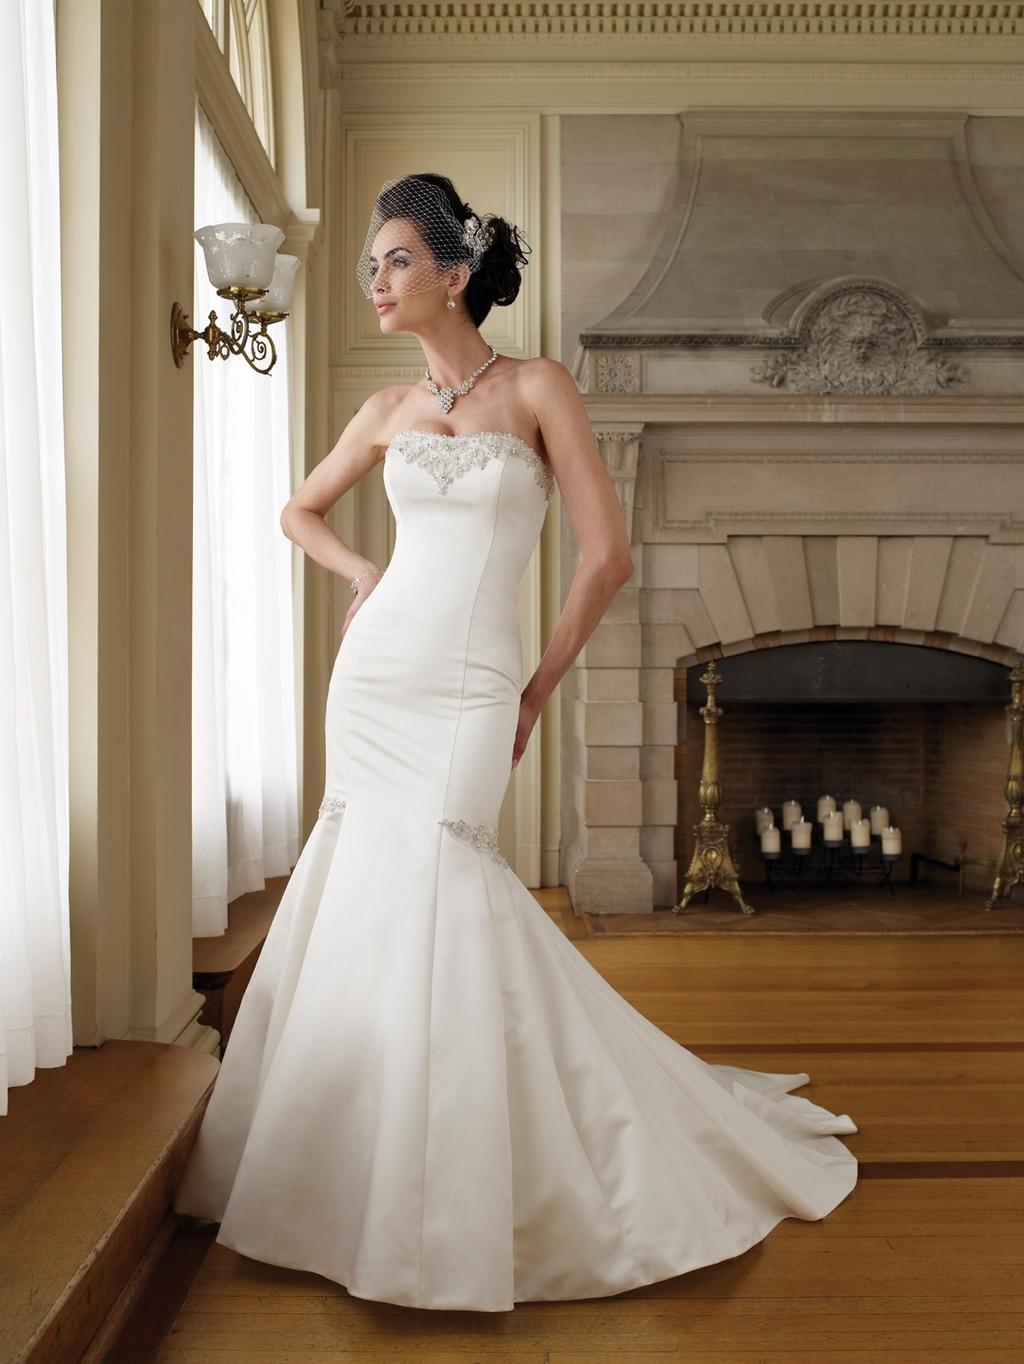 111209-mon-cheri-bridals-2011-wedding-dress-mermaid-trumpet-ivory-strapless.full